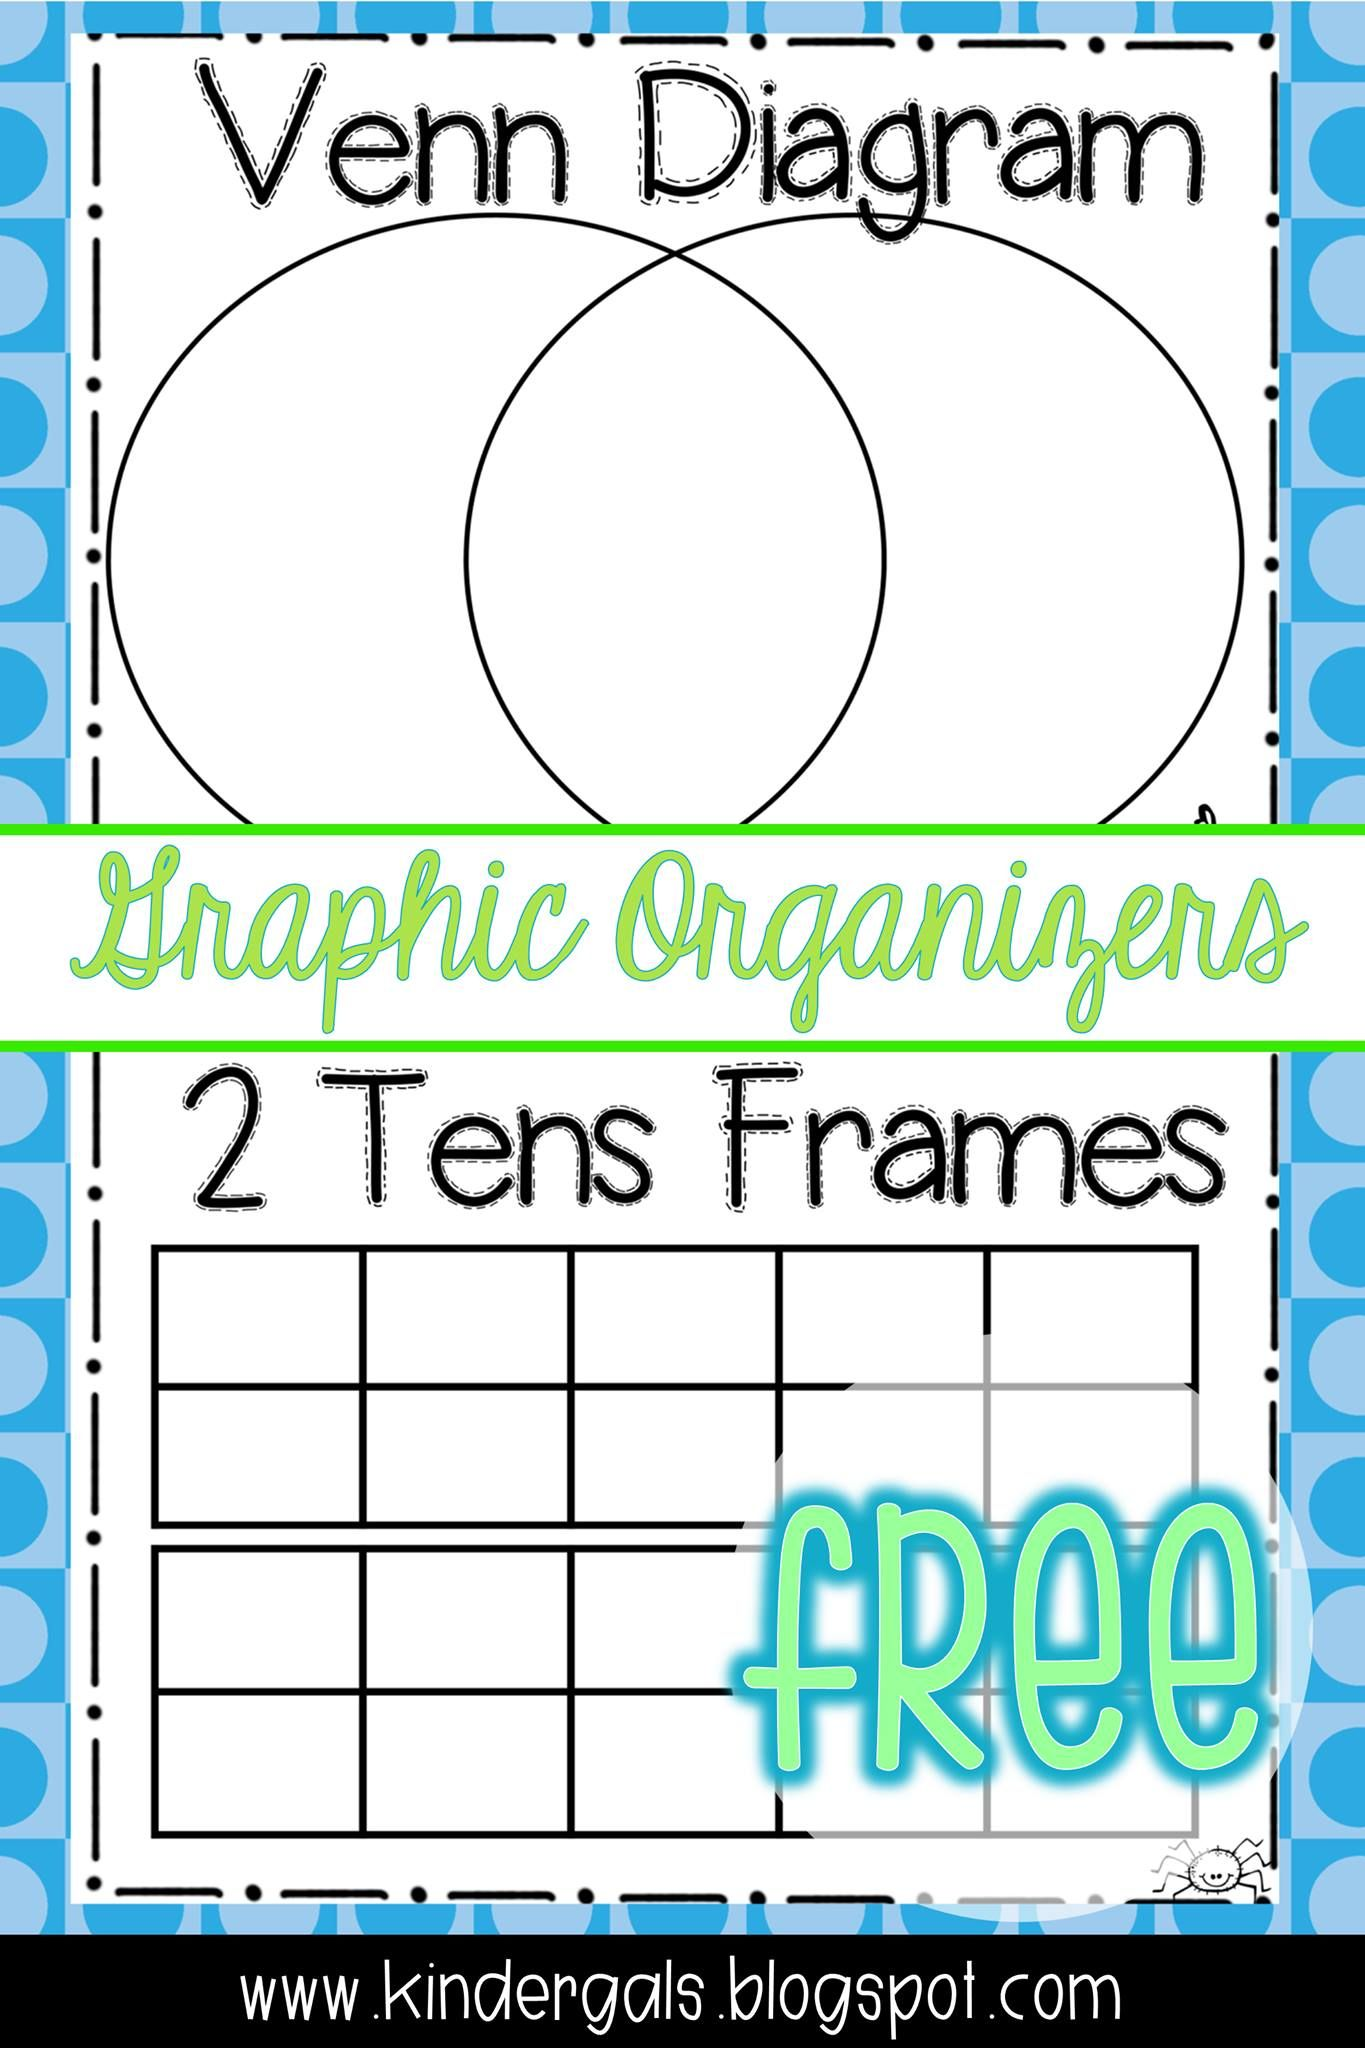 venn diagram and 2 tens frames free downloads for kindergarten teachers  [ 1365 x 2048 Pixel ]